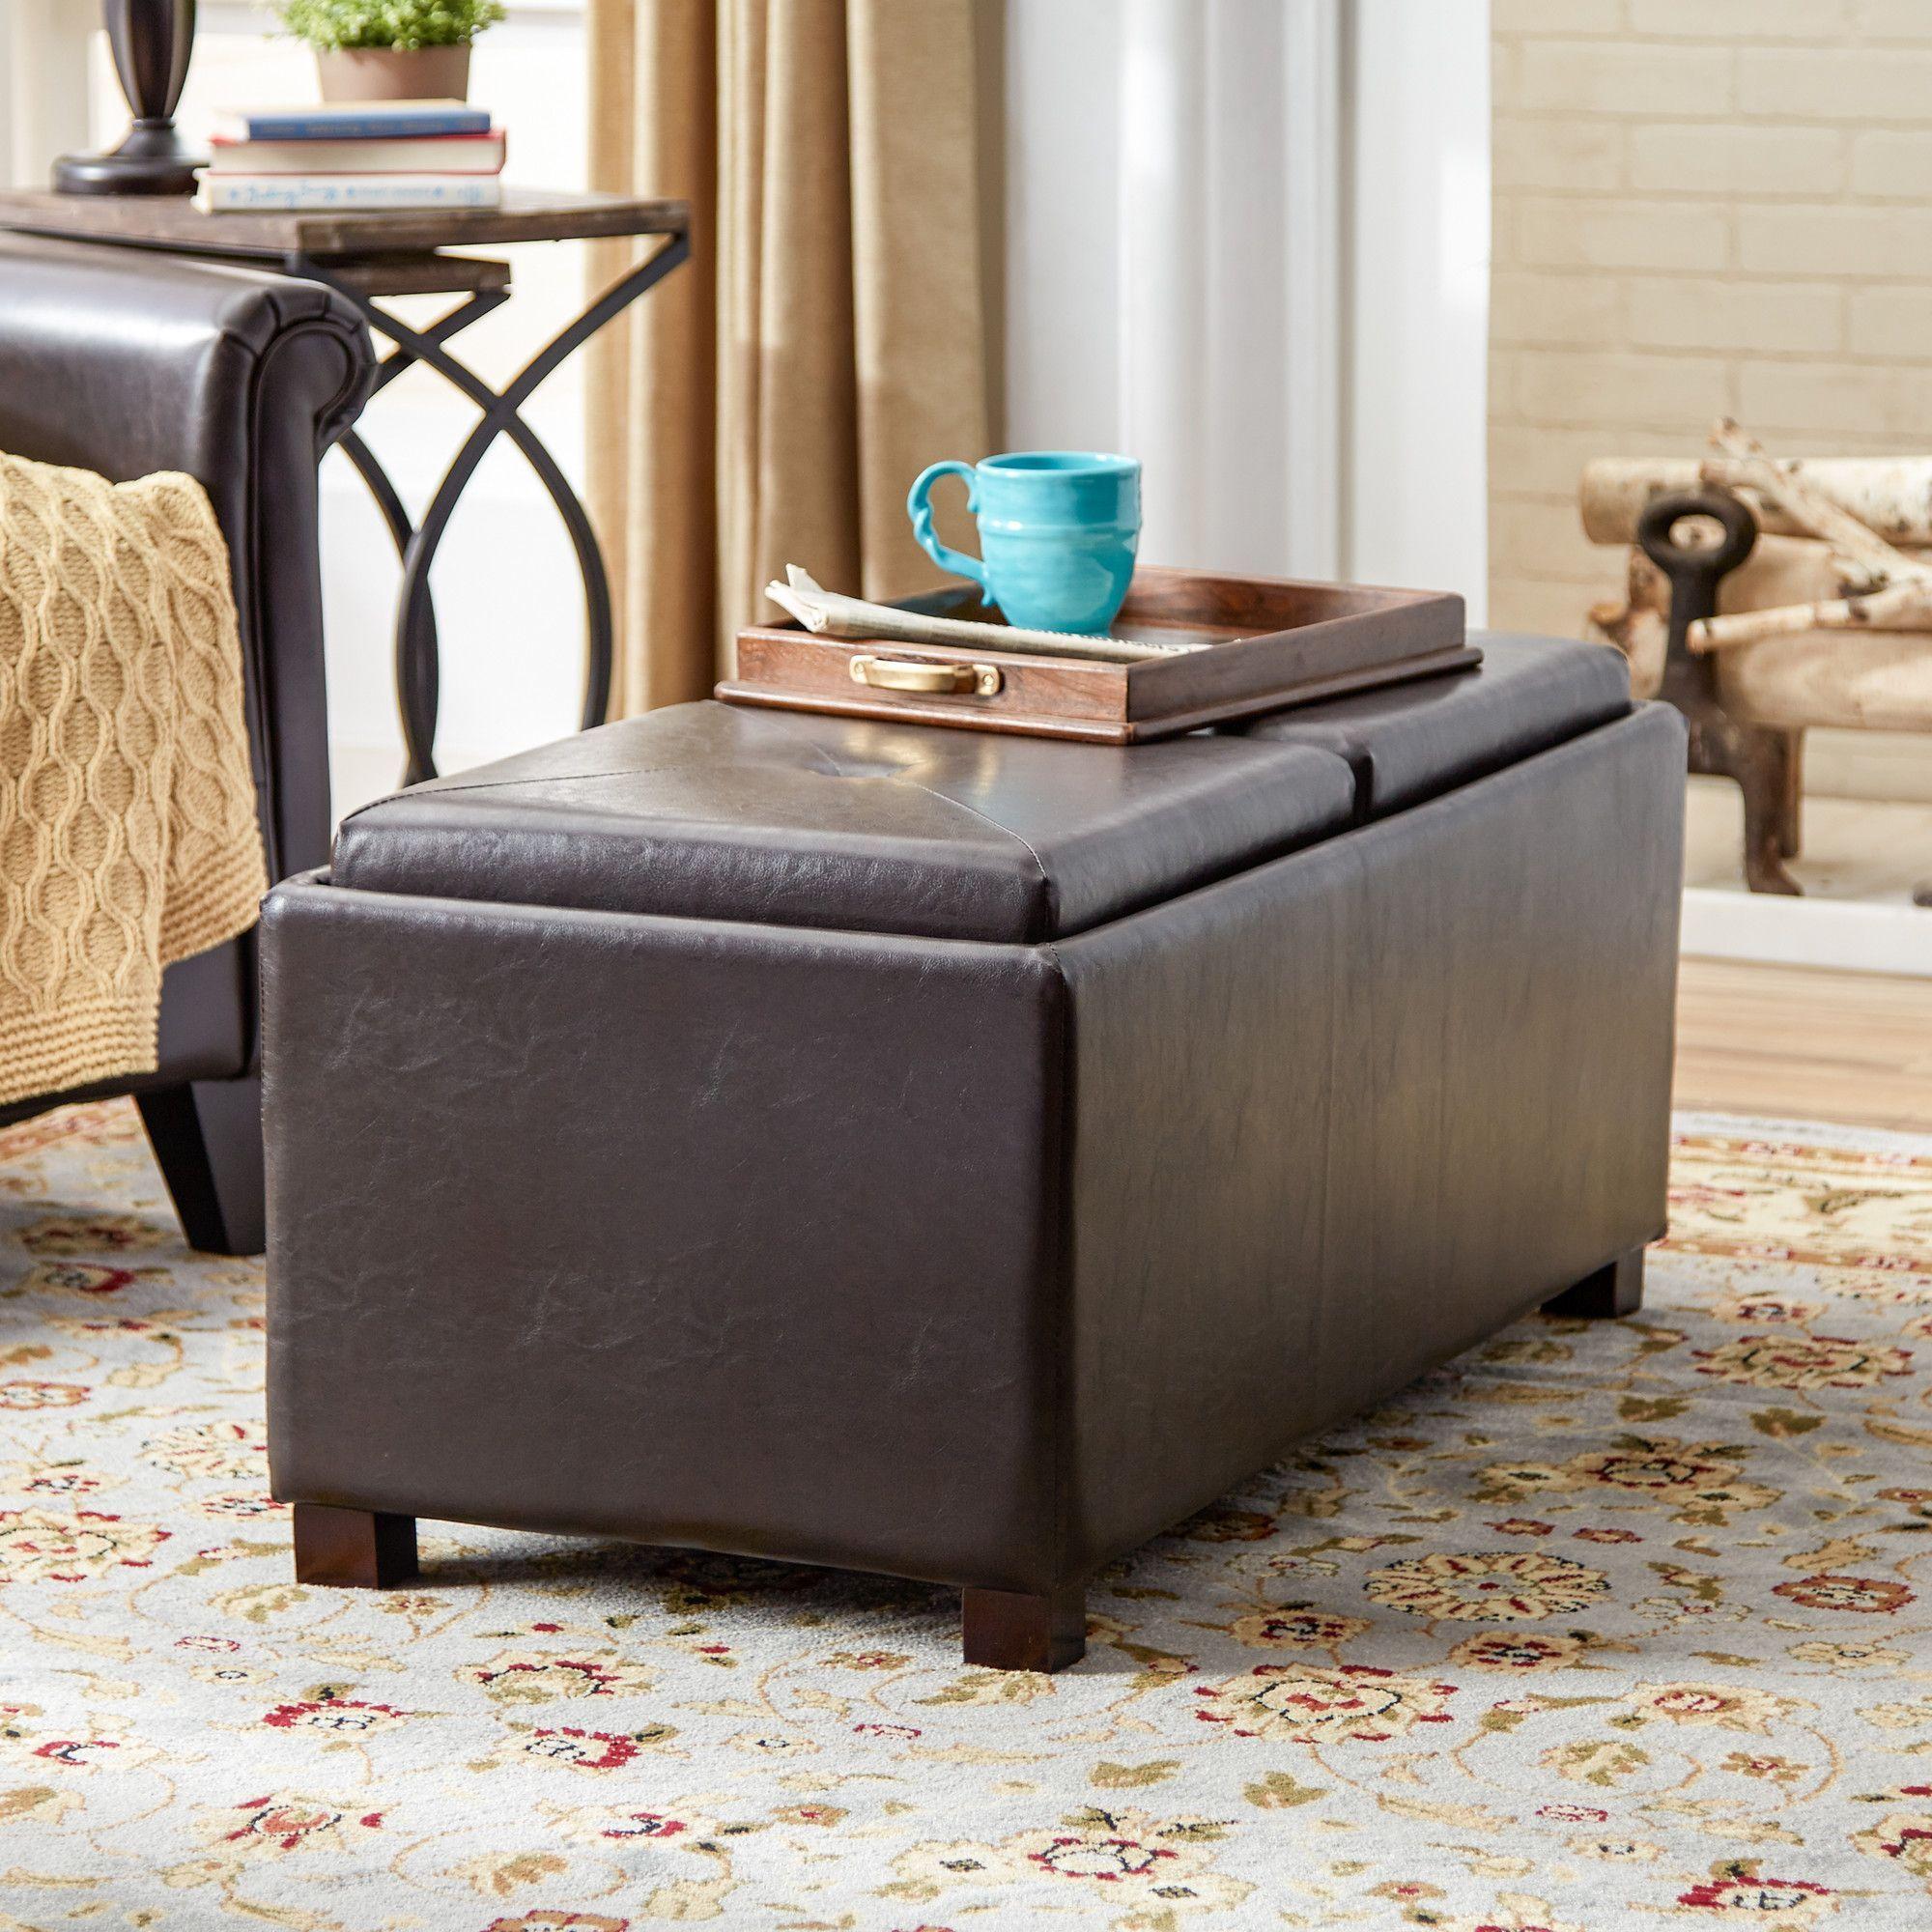 Terrific Clarke Double Tray Storage Ottoman Furniture Ottoman Ibusinesslaw Wood Chair Design Ideas Ibusinesslaworg